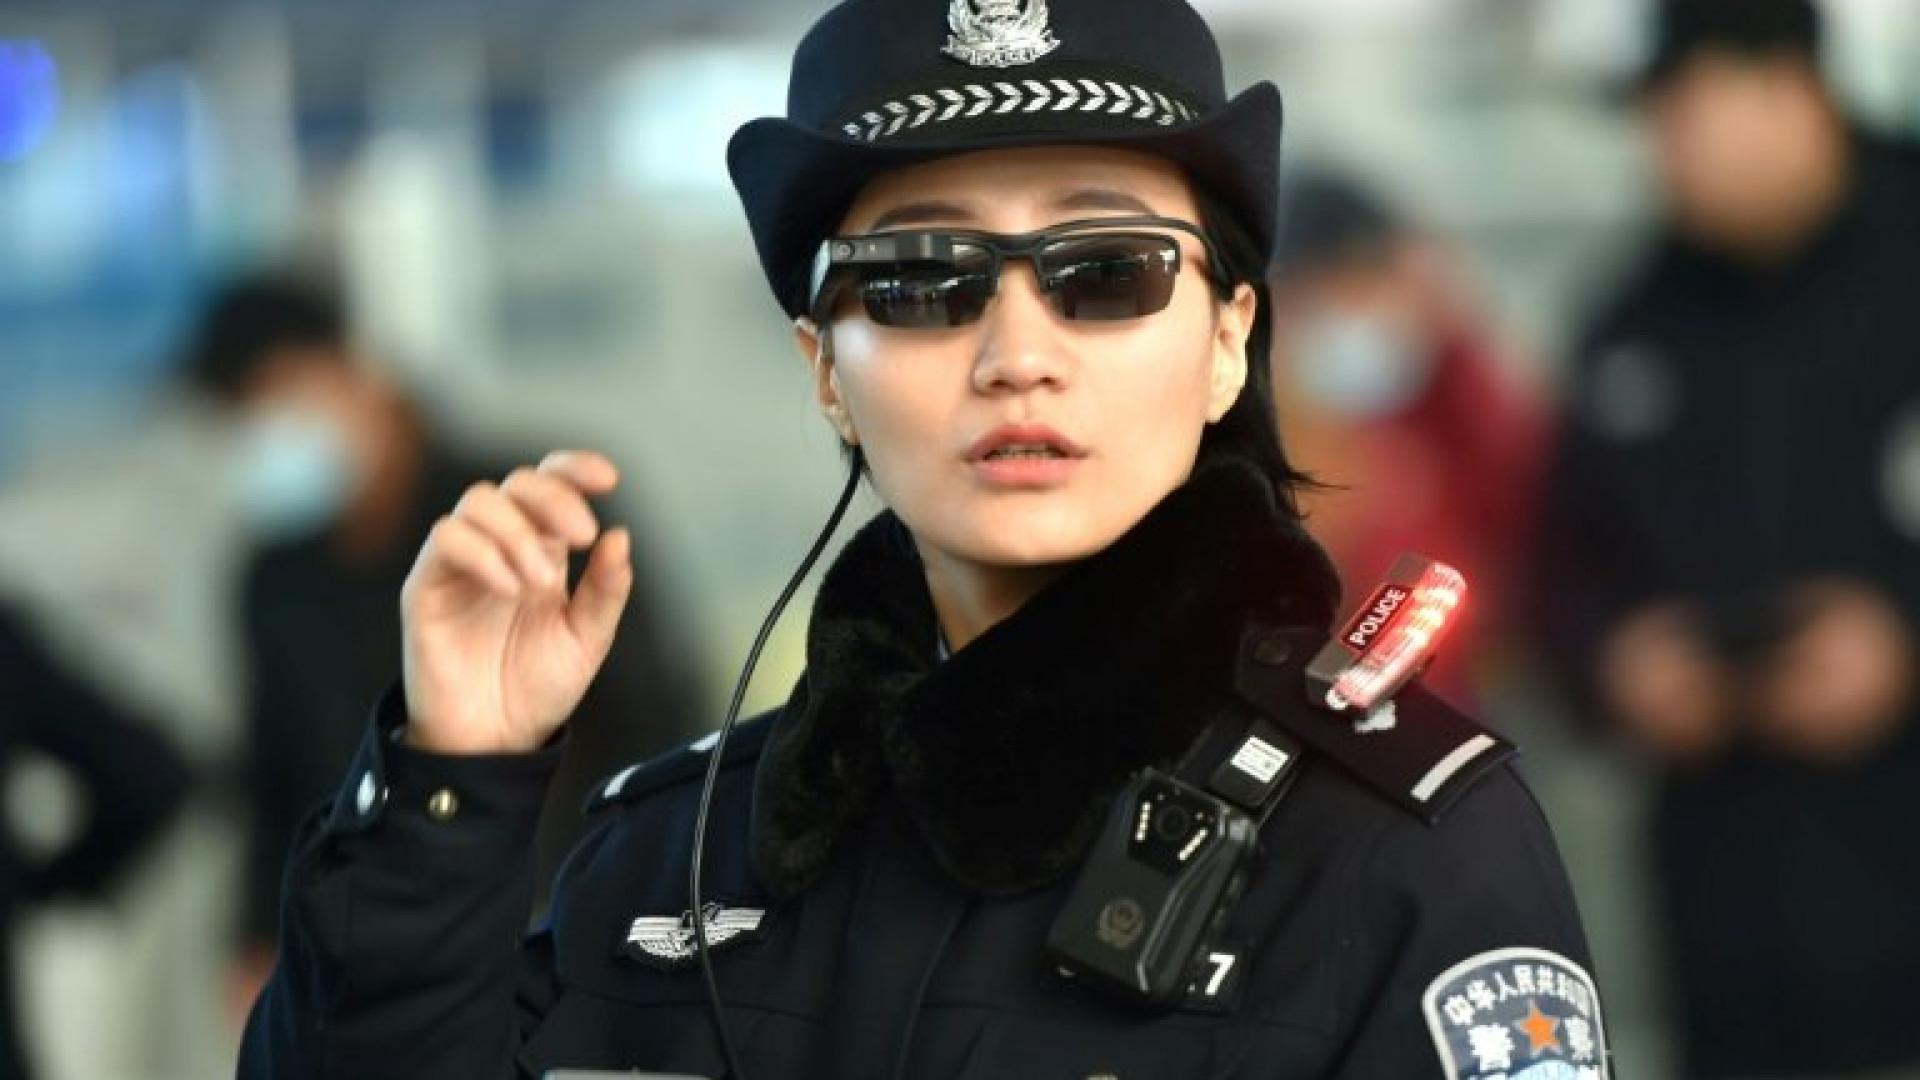 Óculos ajudam polícia chinesa a identificar criminosos